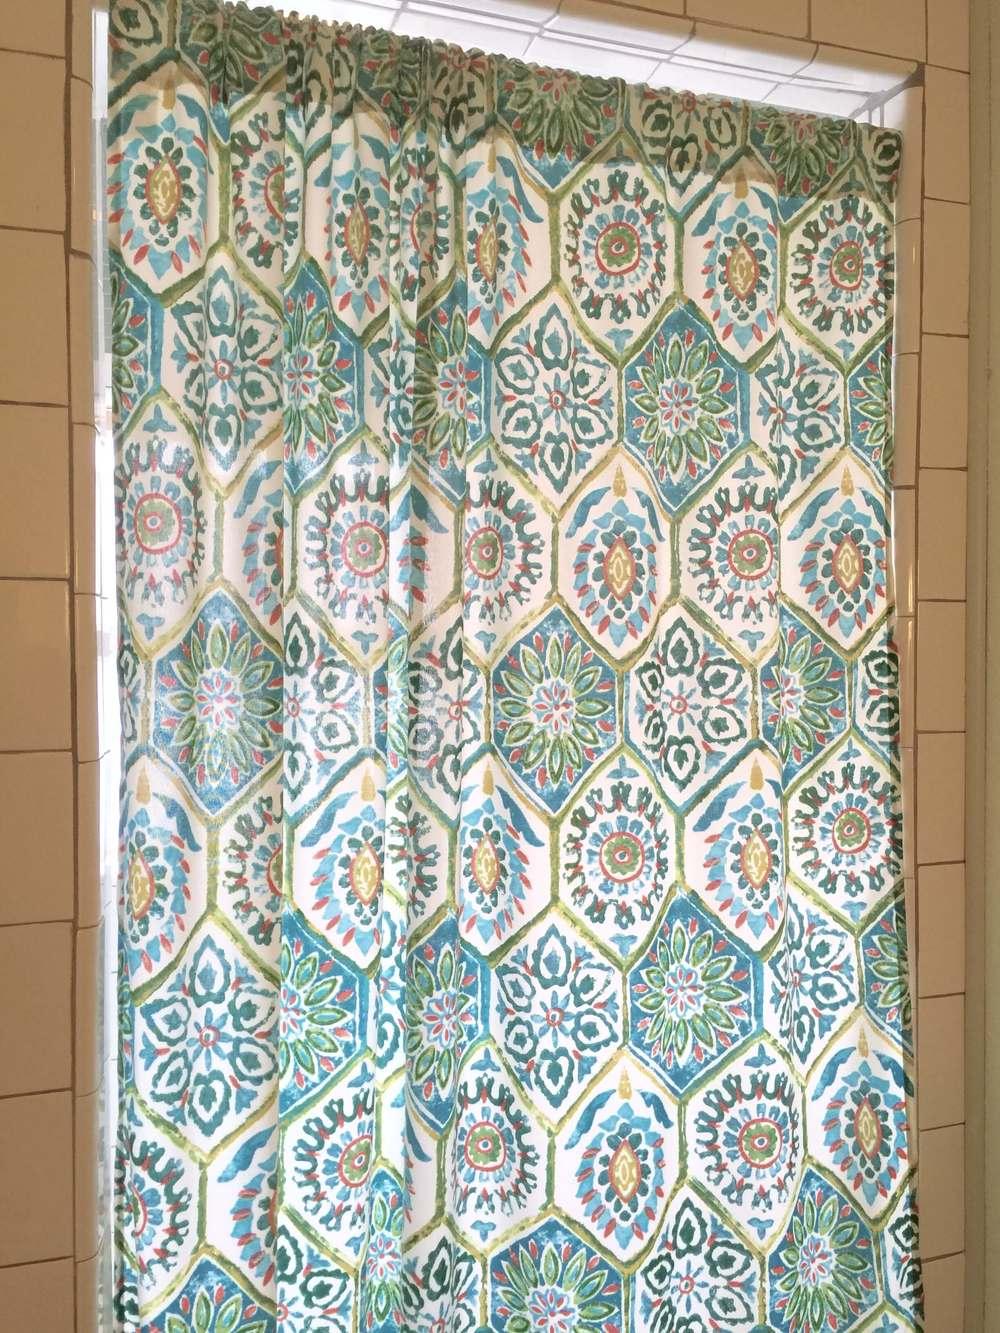 Bathroom - Shower curtain is a shortened outdoor curtain.